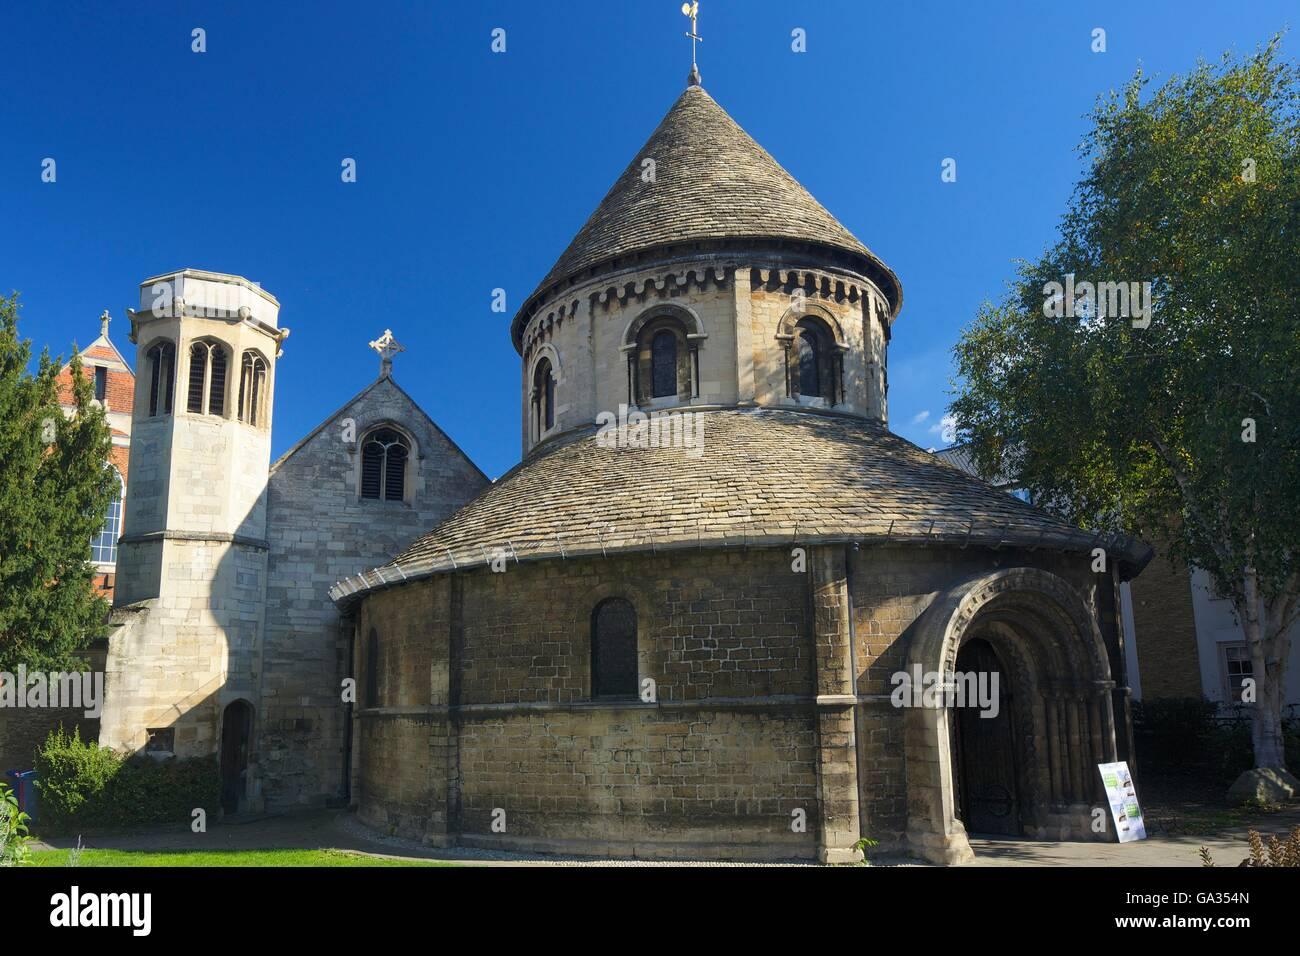 Church of Holy Sepulchre, or Round Church, Cambridge, Cambridgeshire, England, UK, GB, Europe - Stock Image